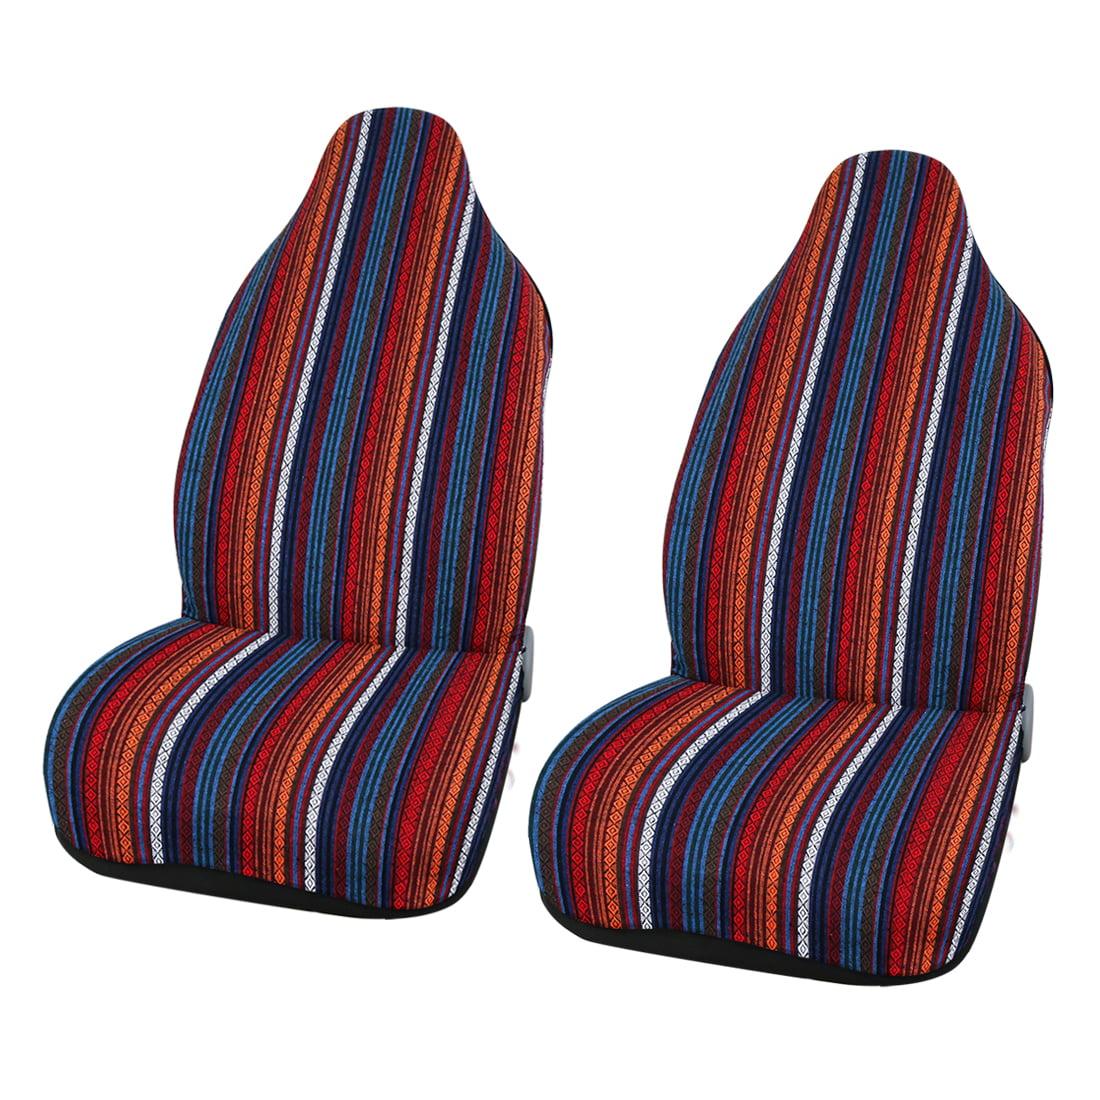 2pcs Universal Baja Blanket Car SUV Auto Bucket Front Seat Cover Protectors